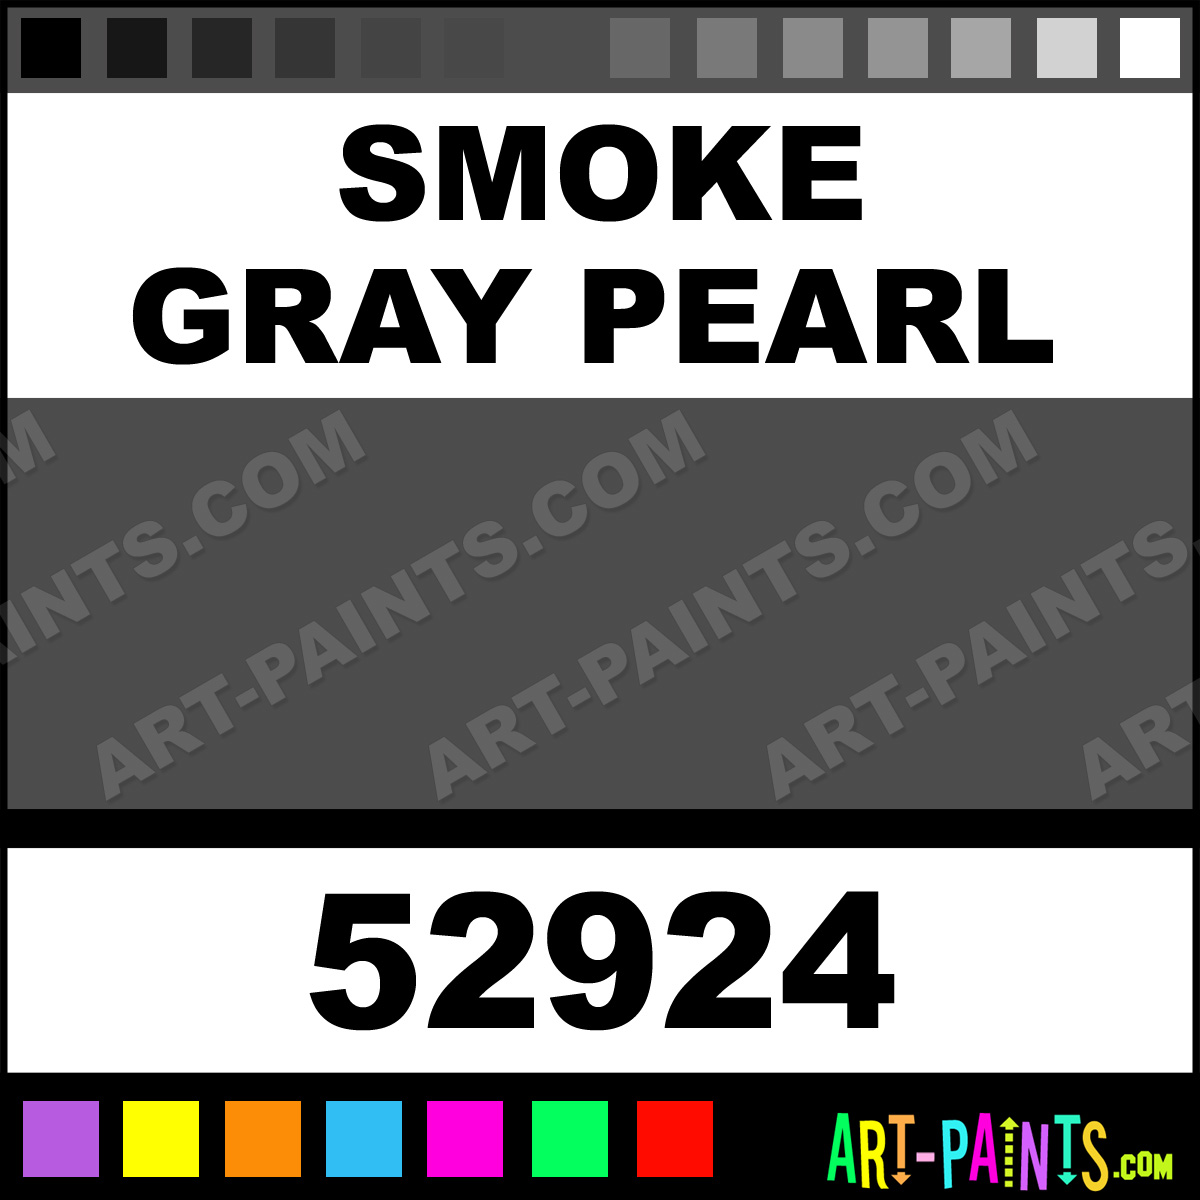 Ceramic Car Wax >> Smoke Gray Pearl Car and Truck Enamel Paints - 52924 - Smoke Gray Pearl Paint, Smoke Gray Pearl ...